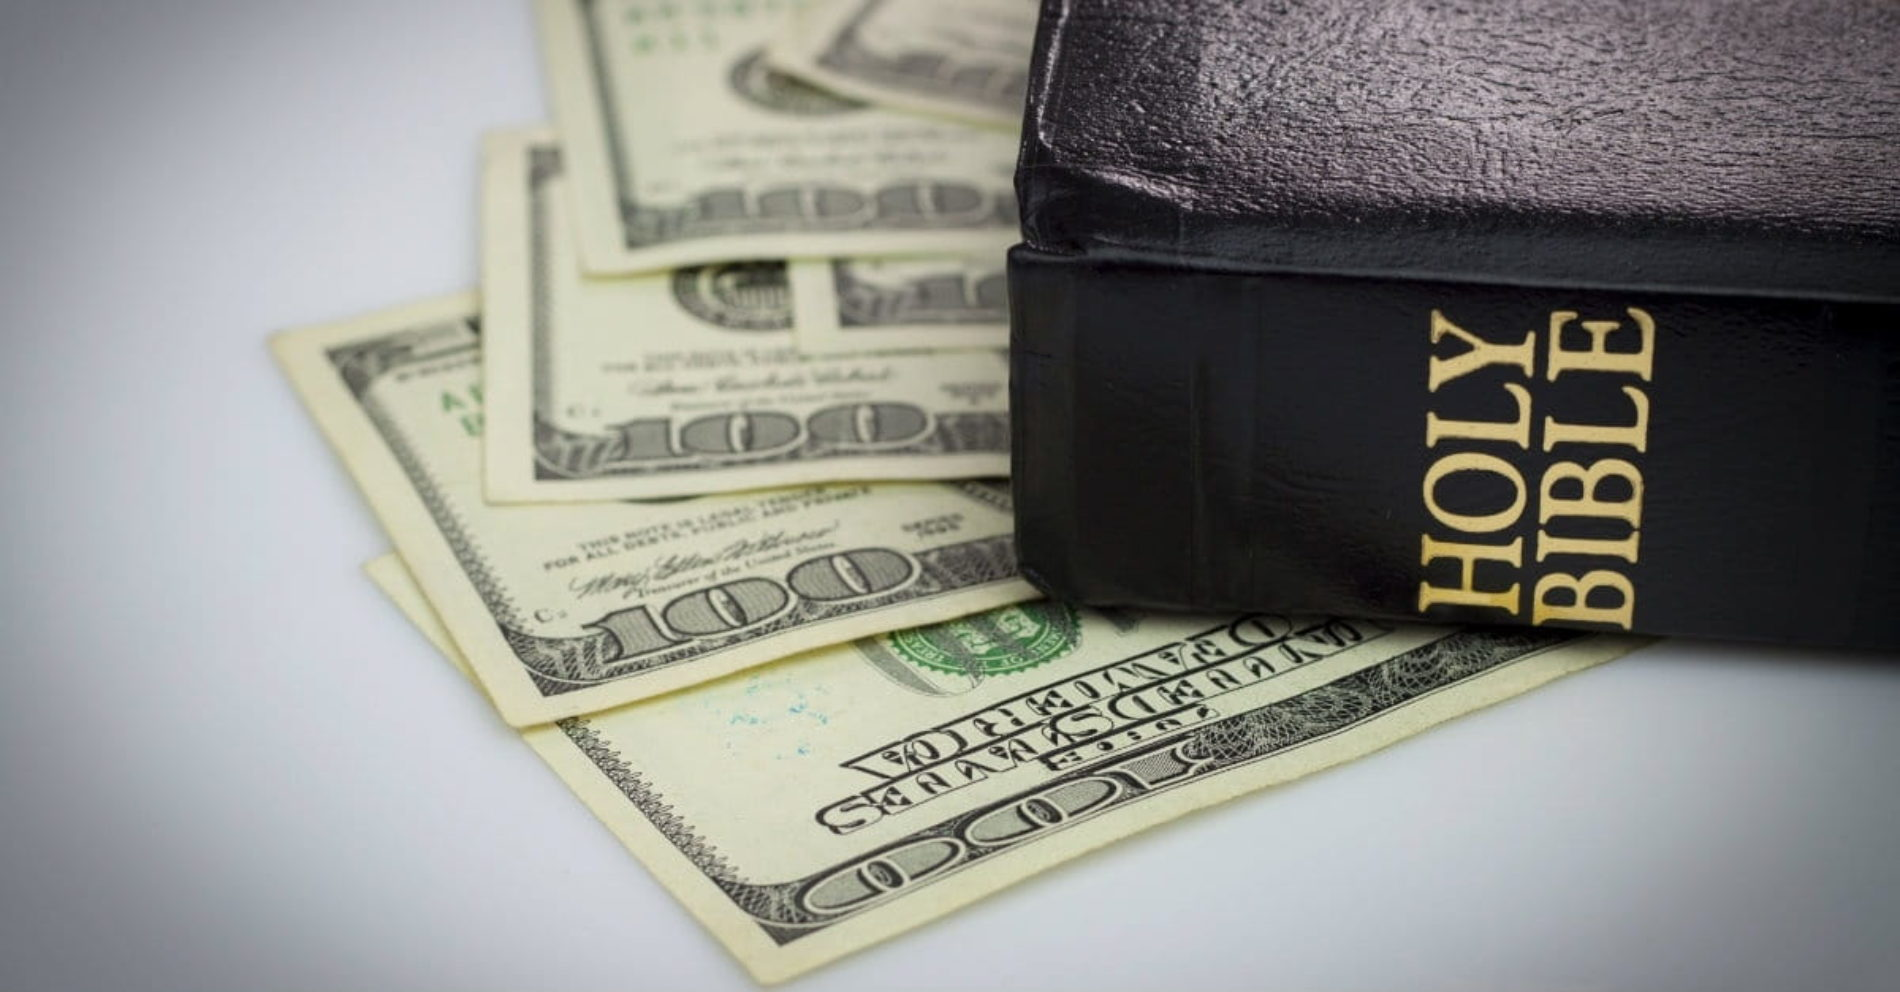 As finanças e a vida espiritual